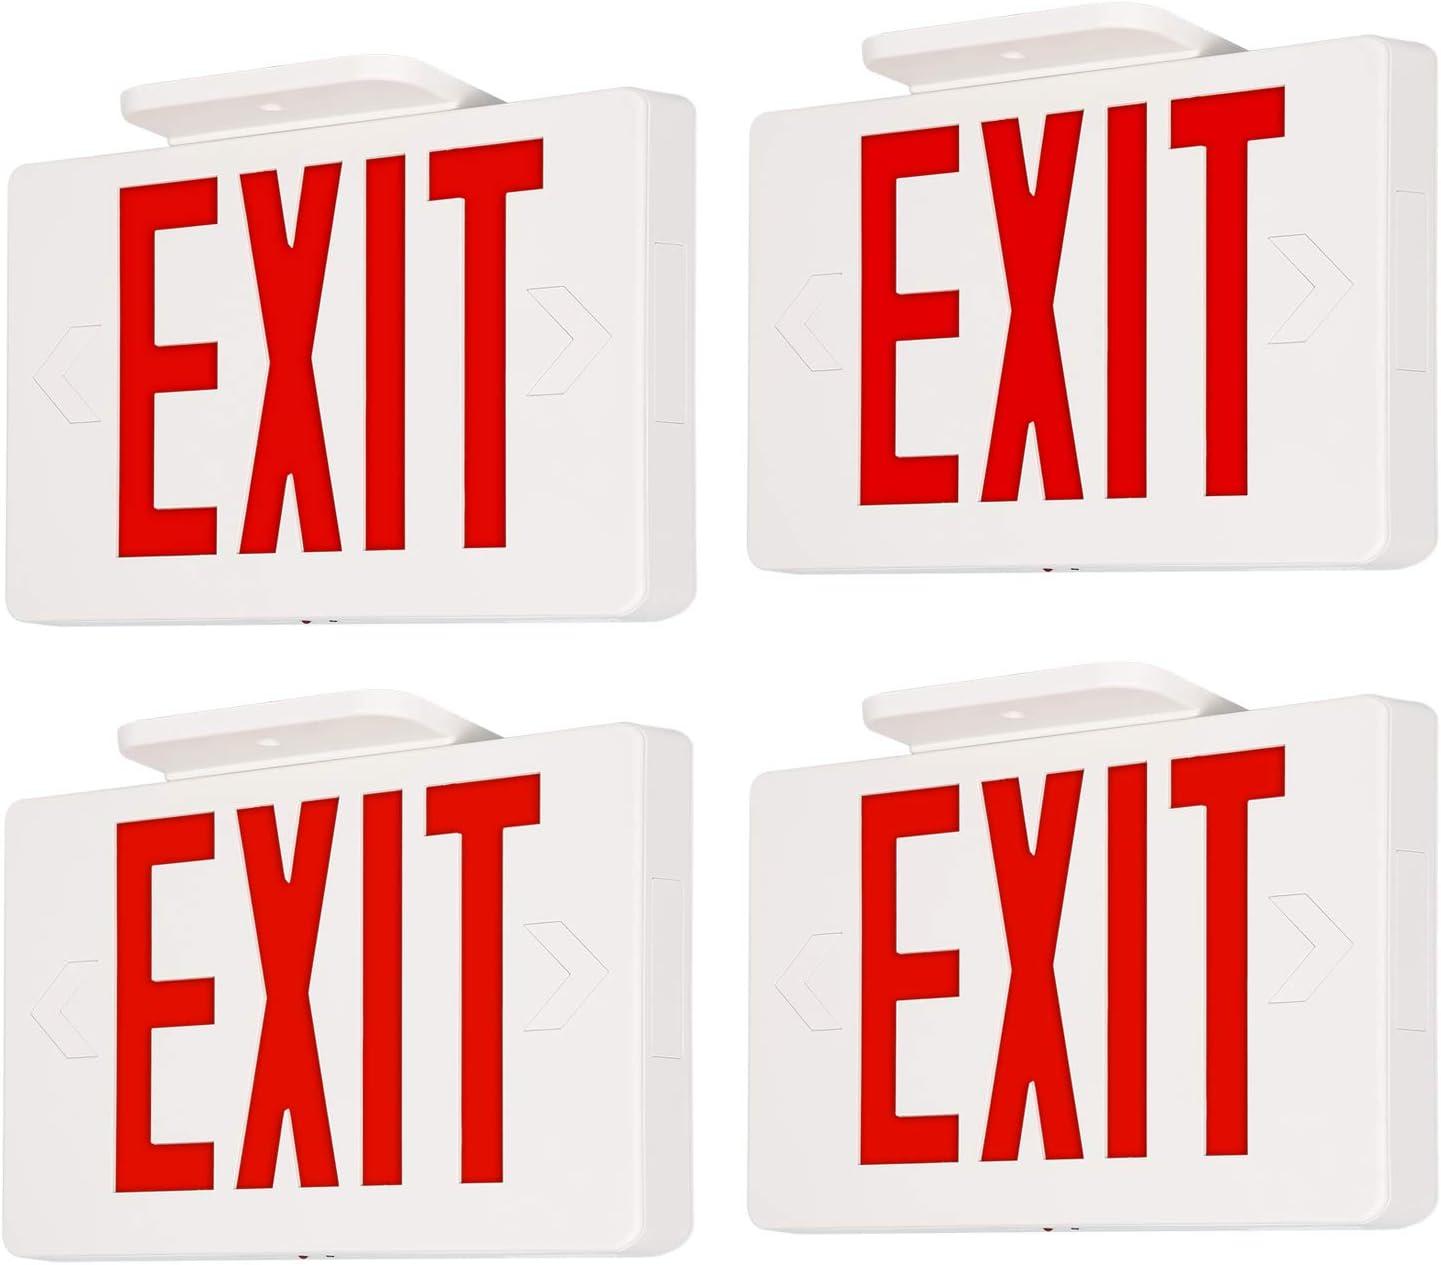 LED Exit Sign, Red Letter Emergency Exit Lights, 120V-277V Universal Mounting Double Face - 4 Pack